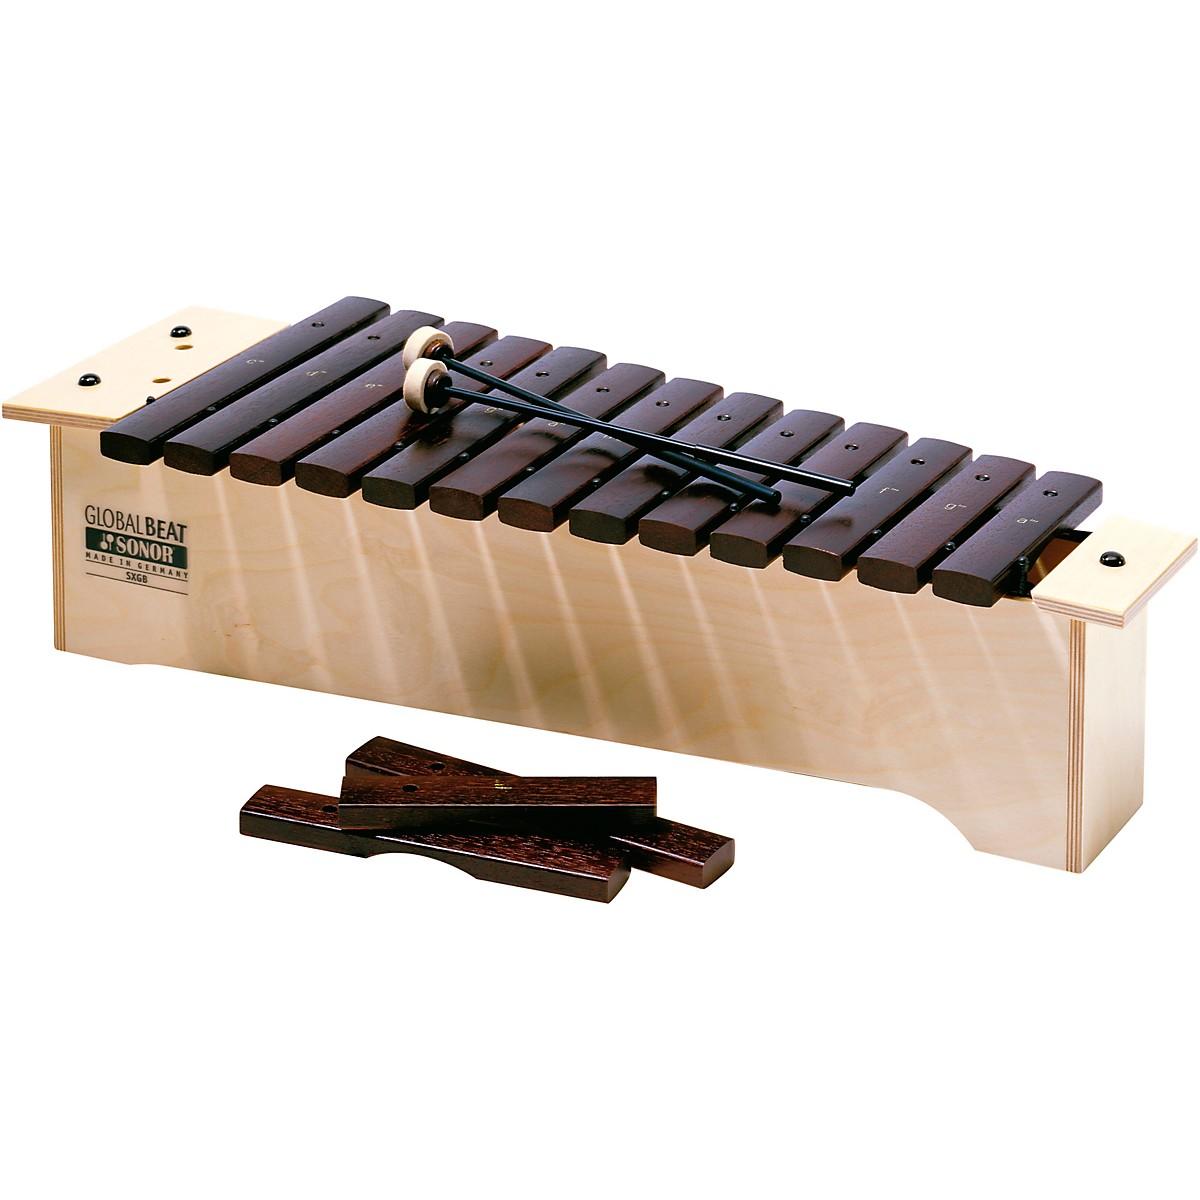 Sonor Orff Global Beat Xylophones